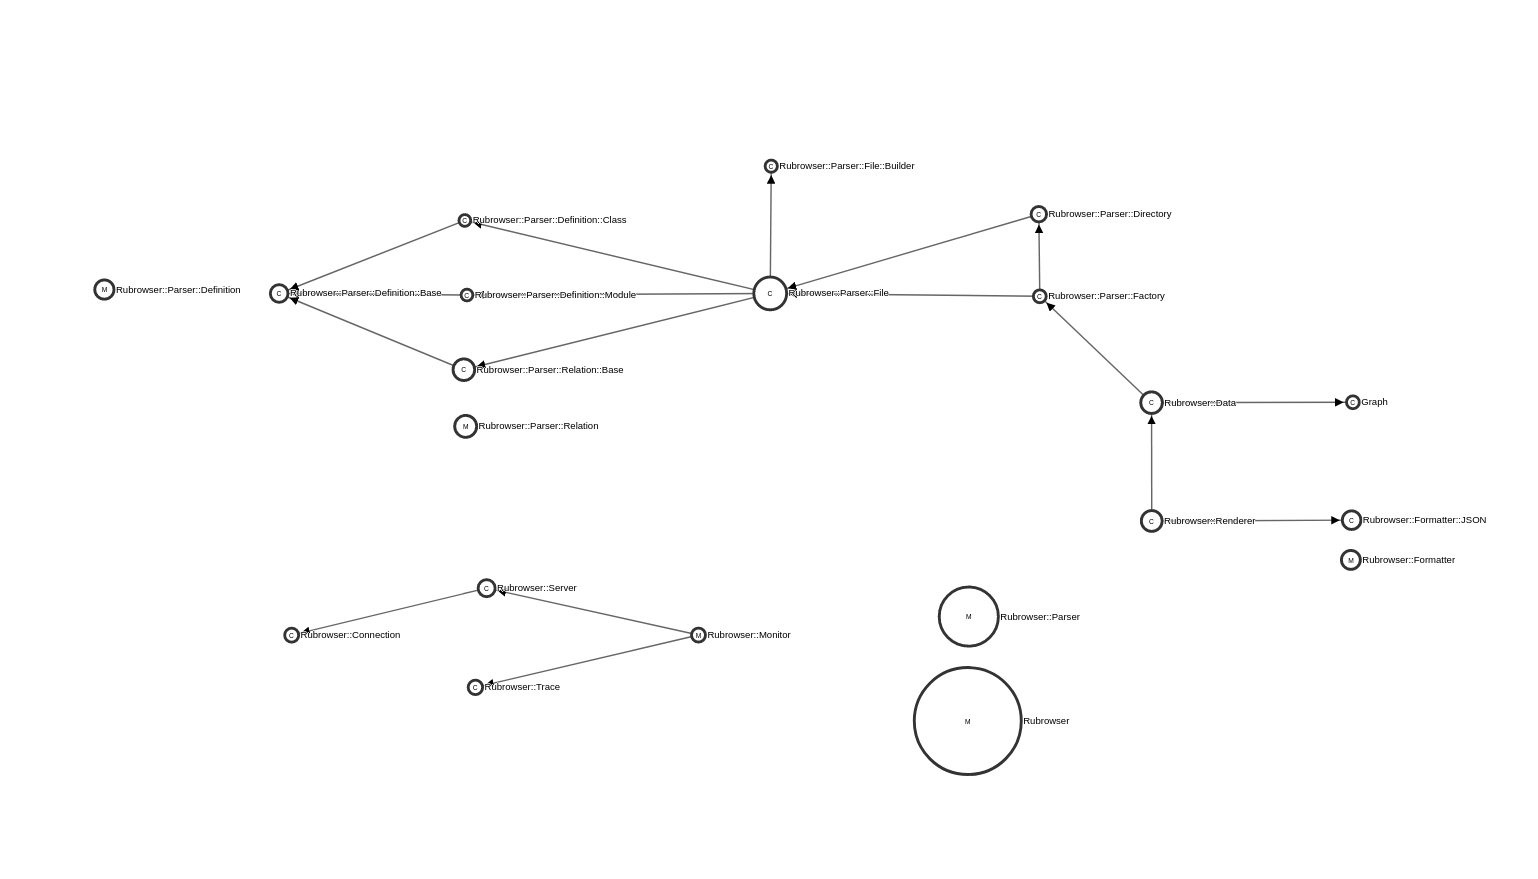 rubrowser visualization